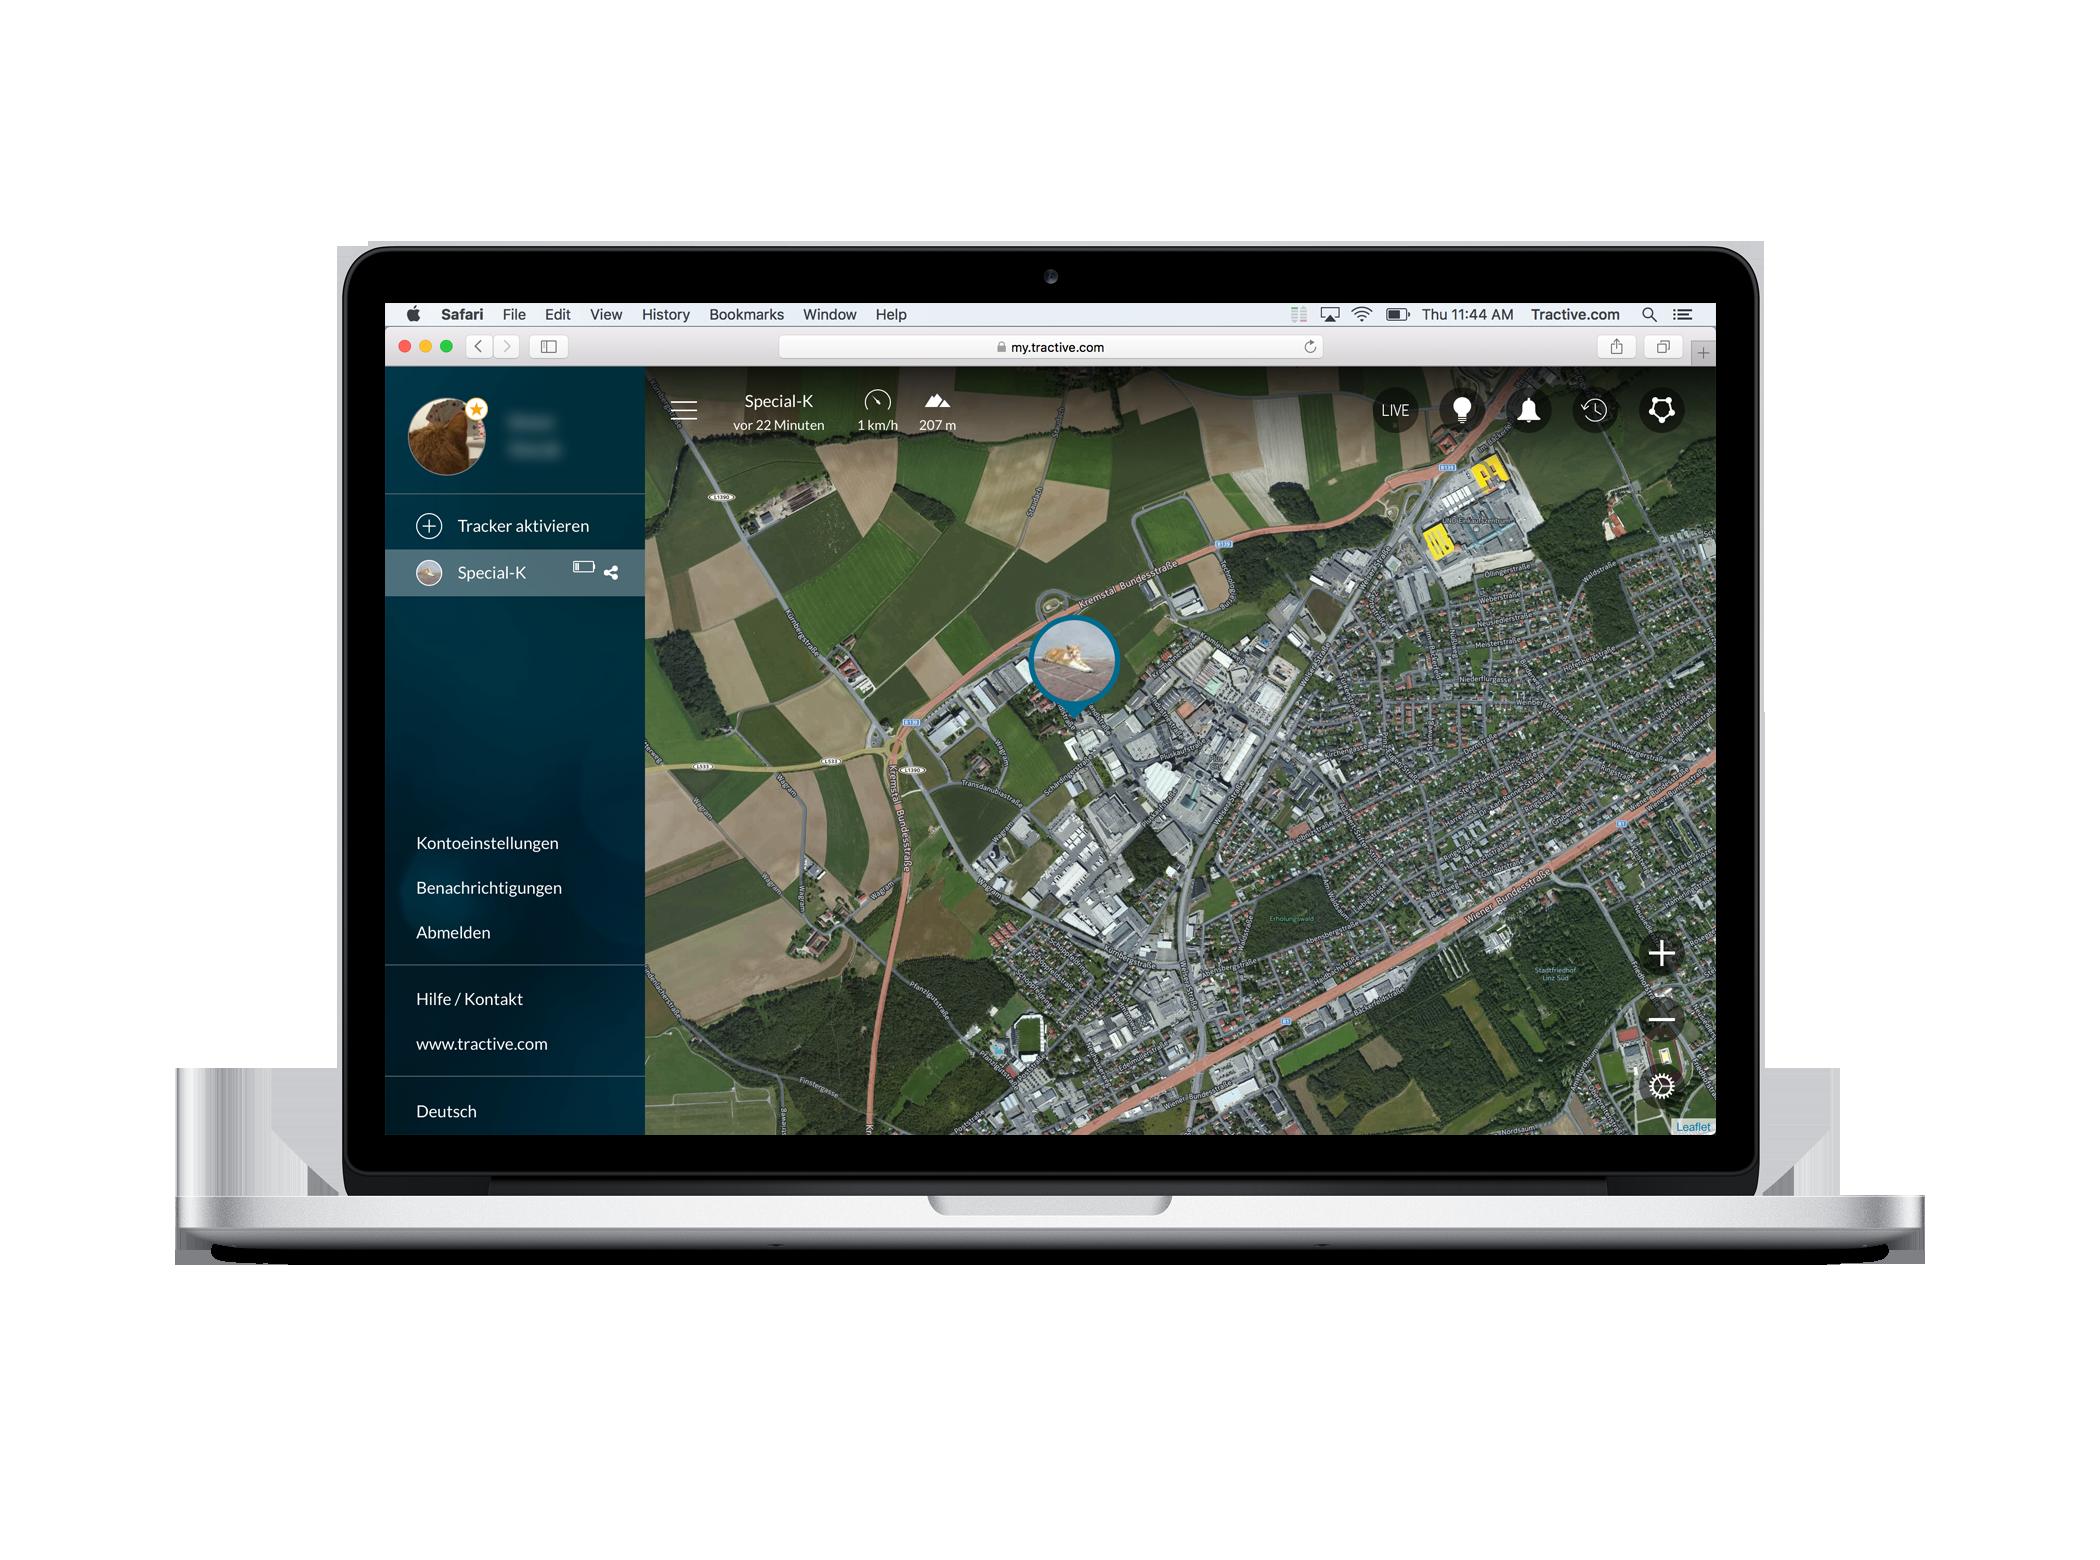 Tractive Webapp - Überblick der Karte